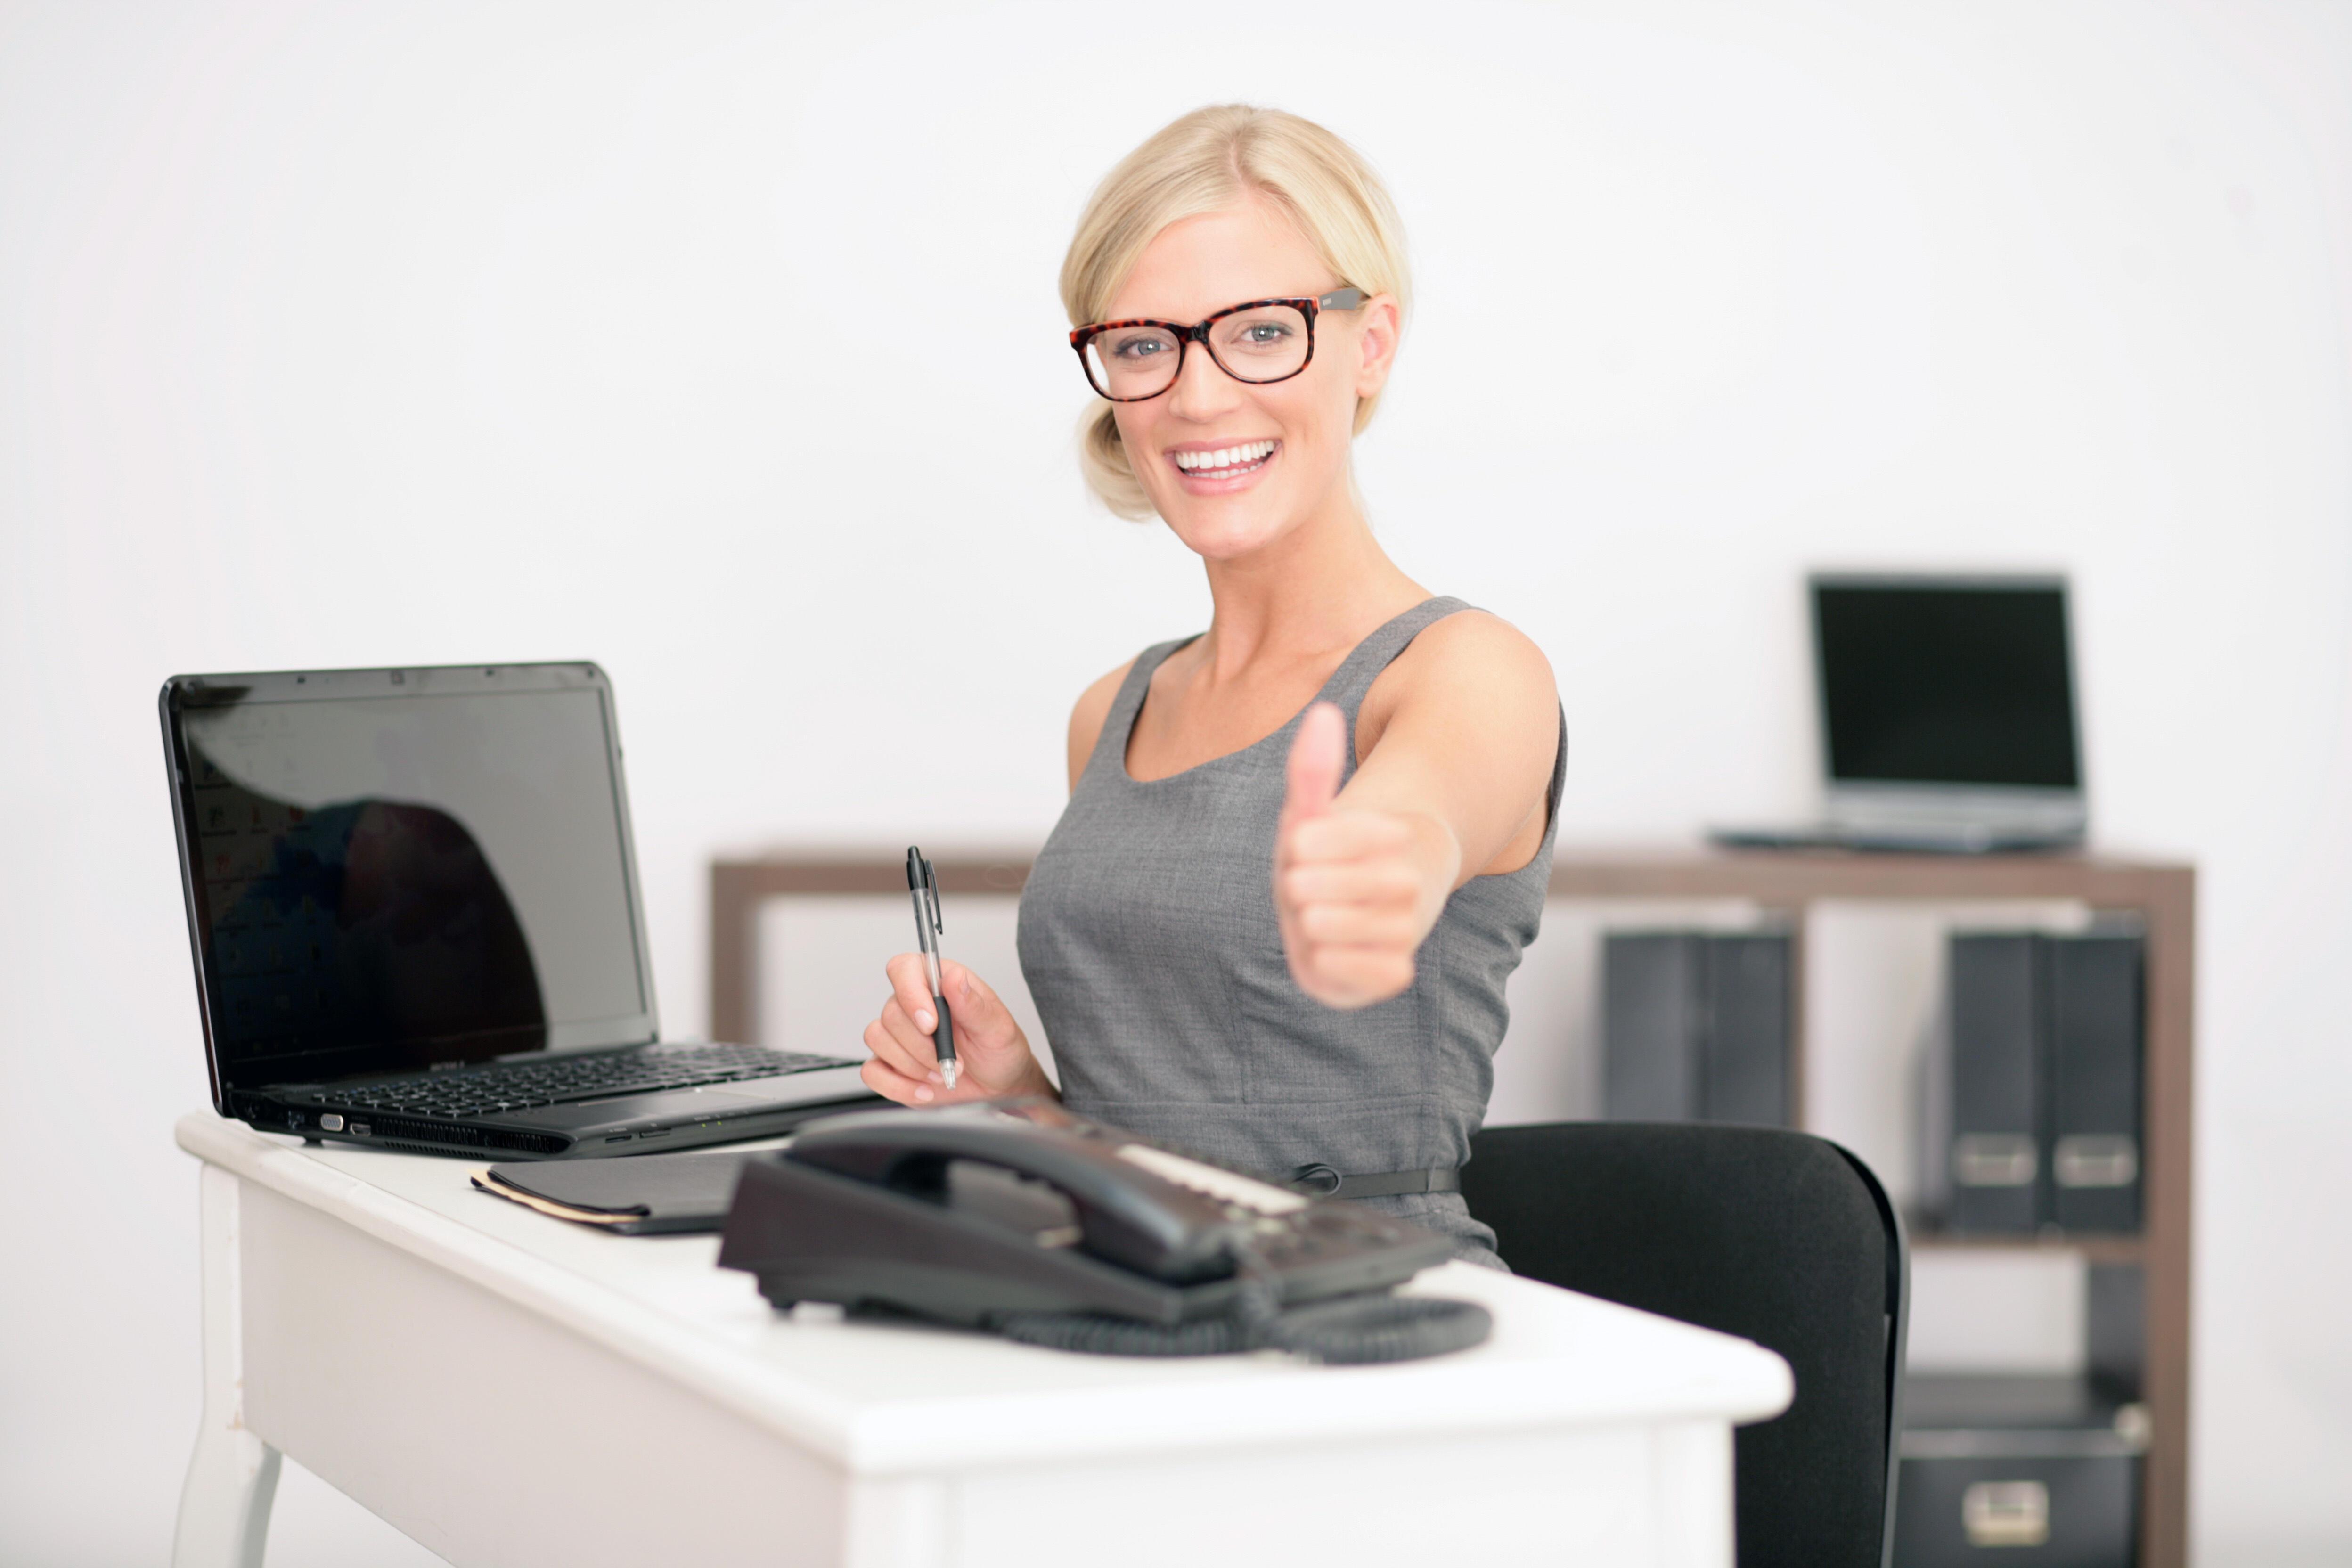 junge Frau am Arbeitsplatz